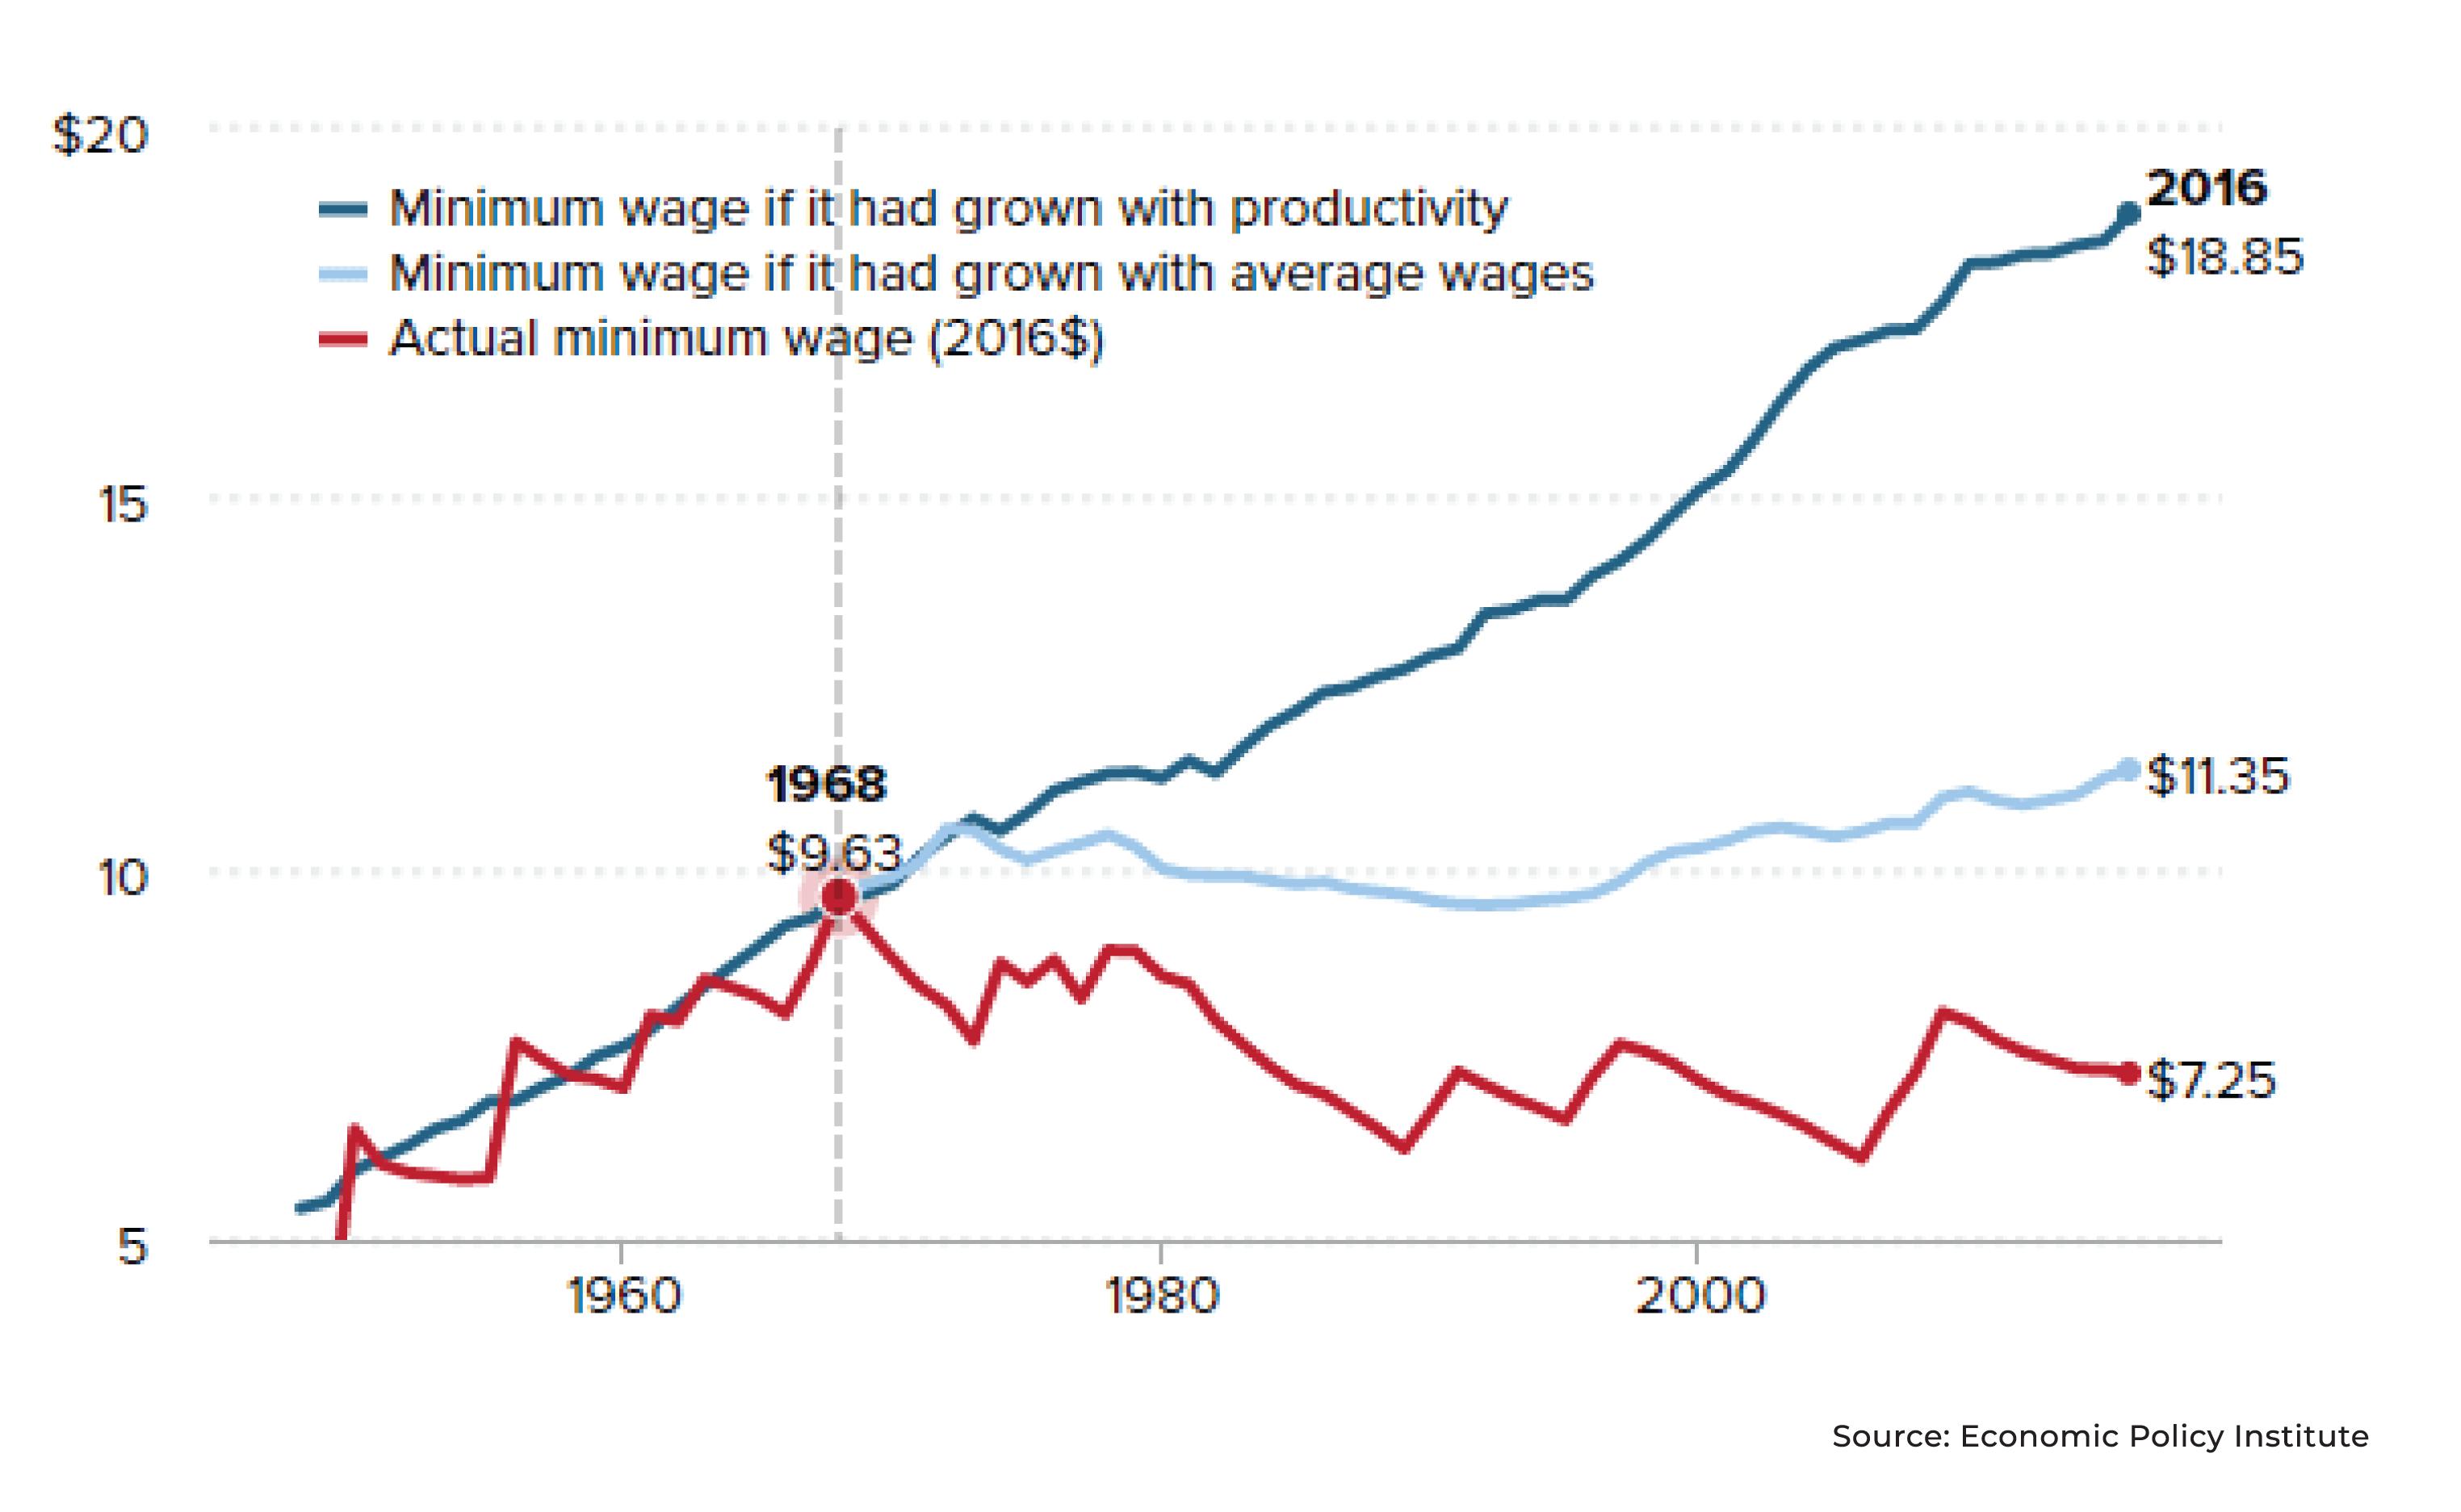 Minimum Wage compare Productivity